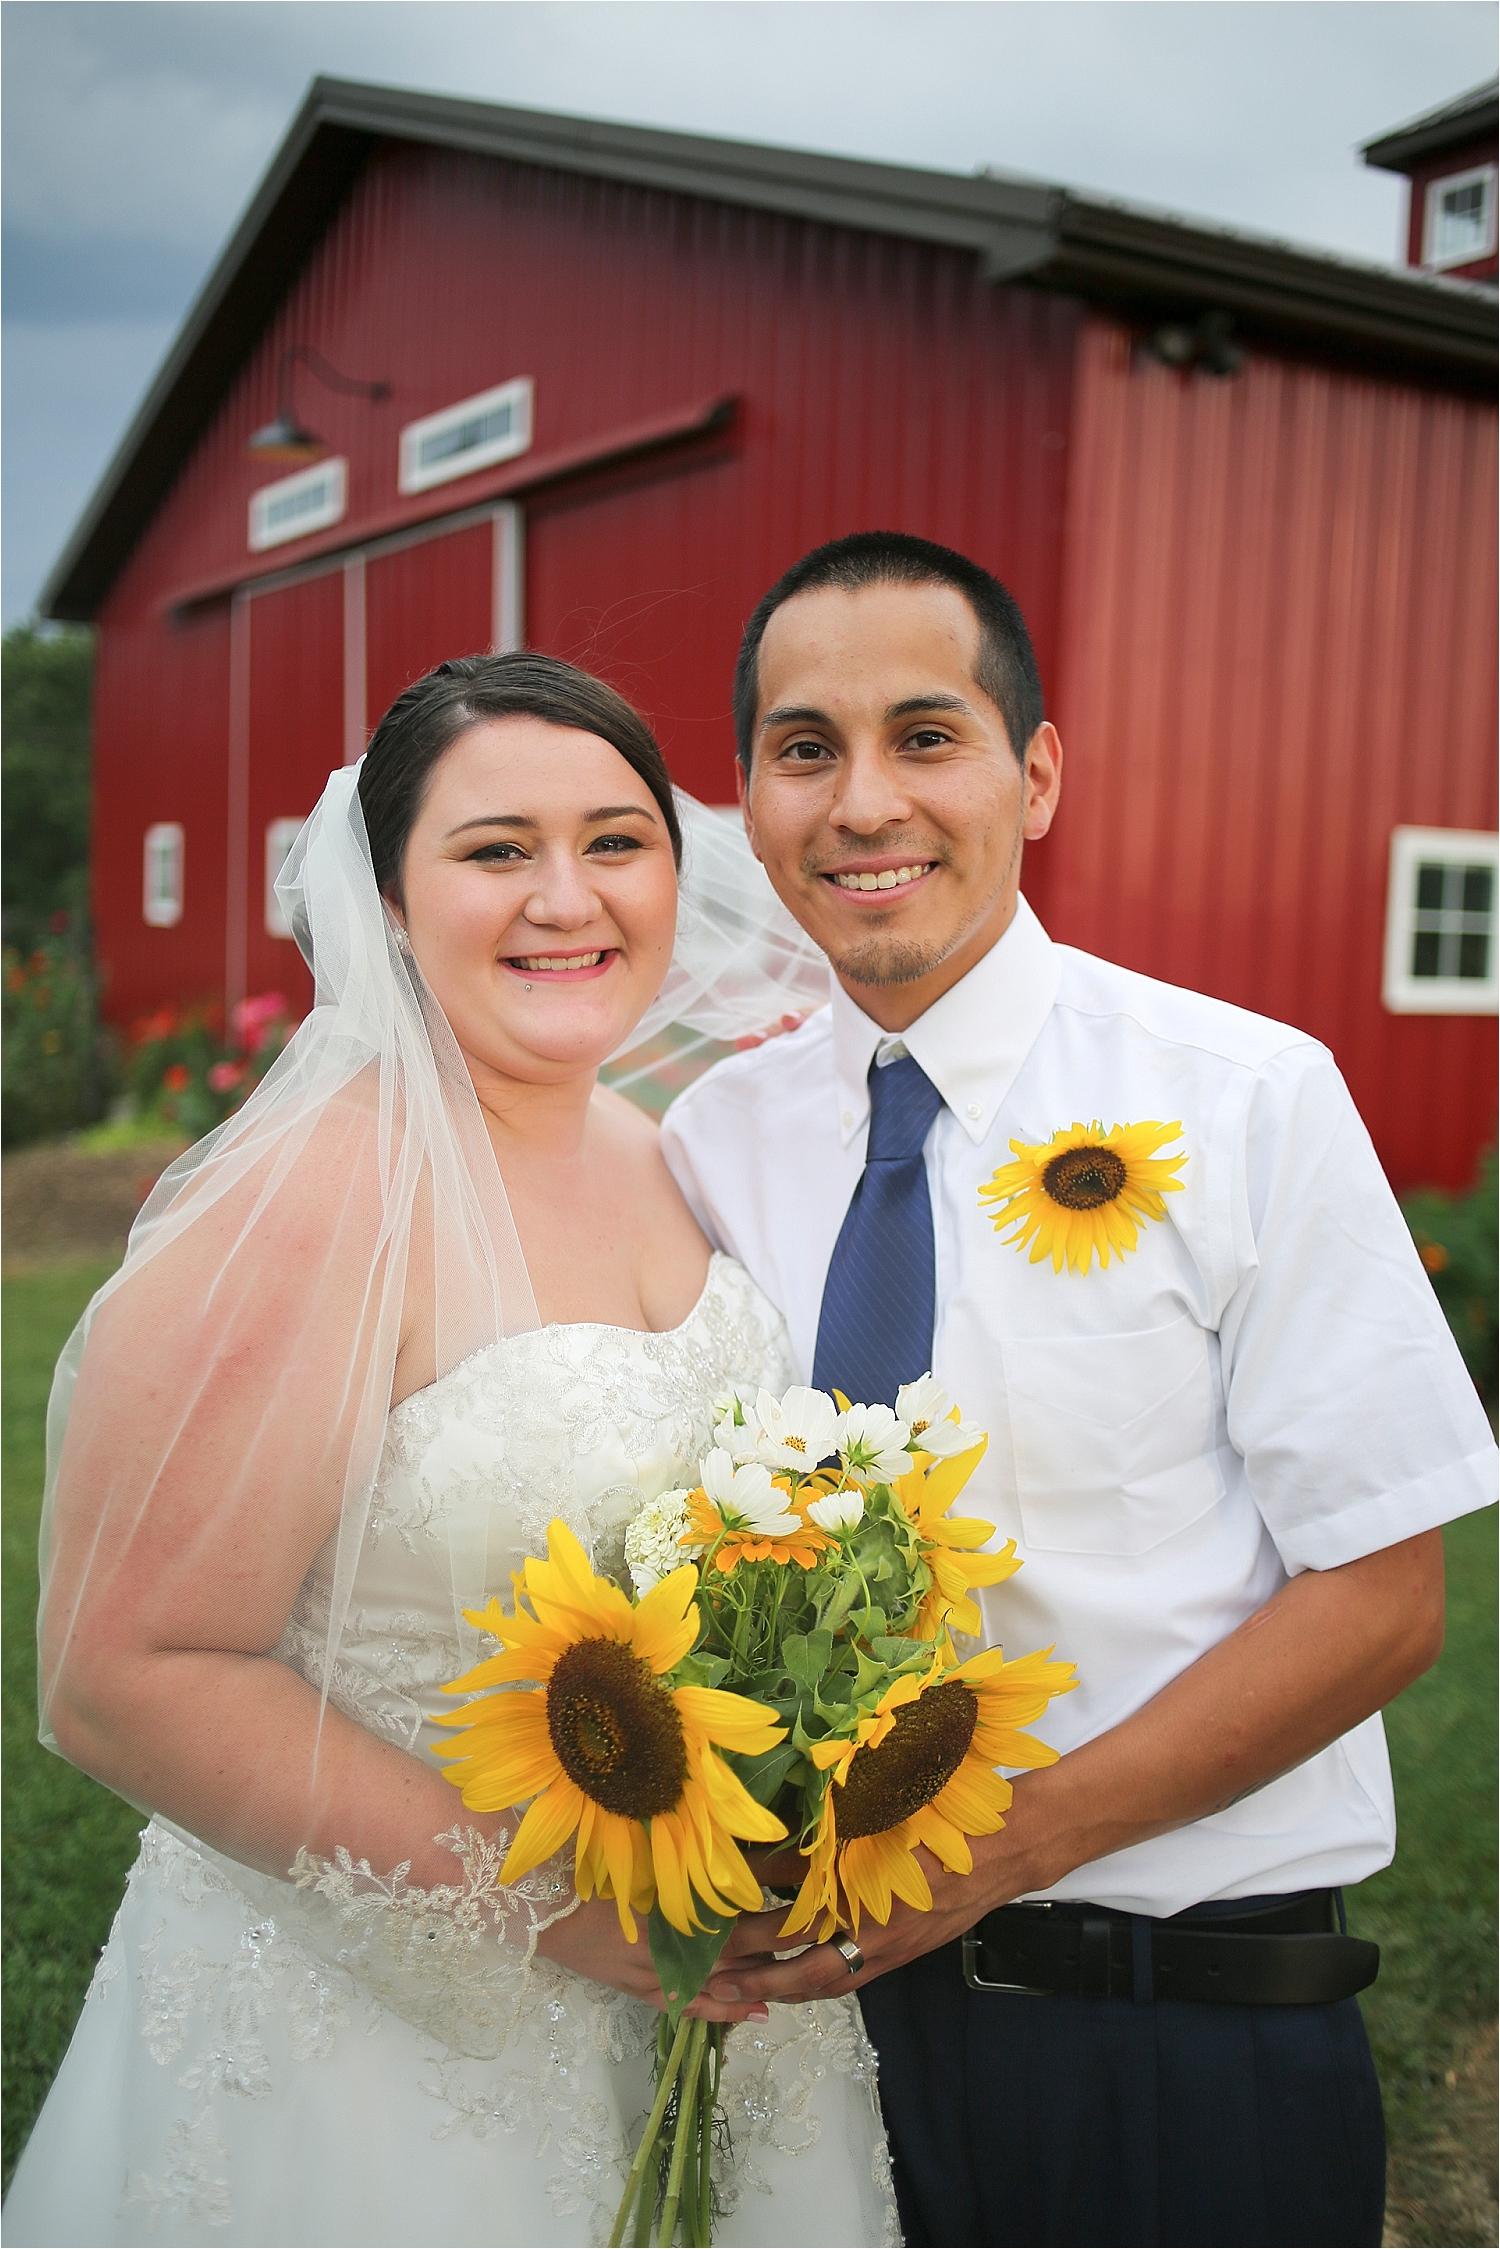 Blacksburg-Wedding-Photographer-_0015.jpg